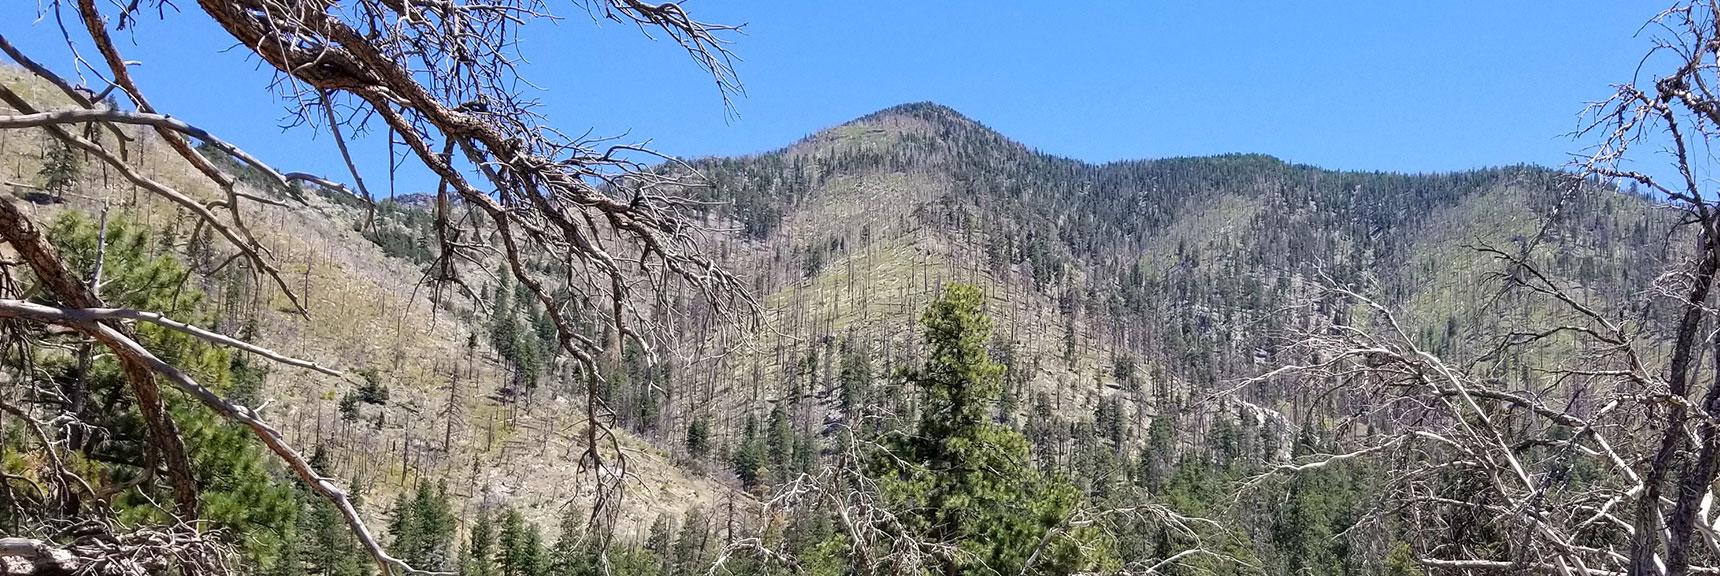 Looking Up Harris Mt. Descent Ridge from Rainbow Sub-Division, Nevada